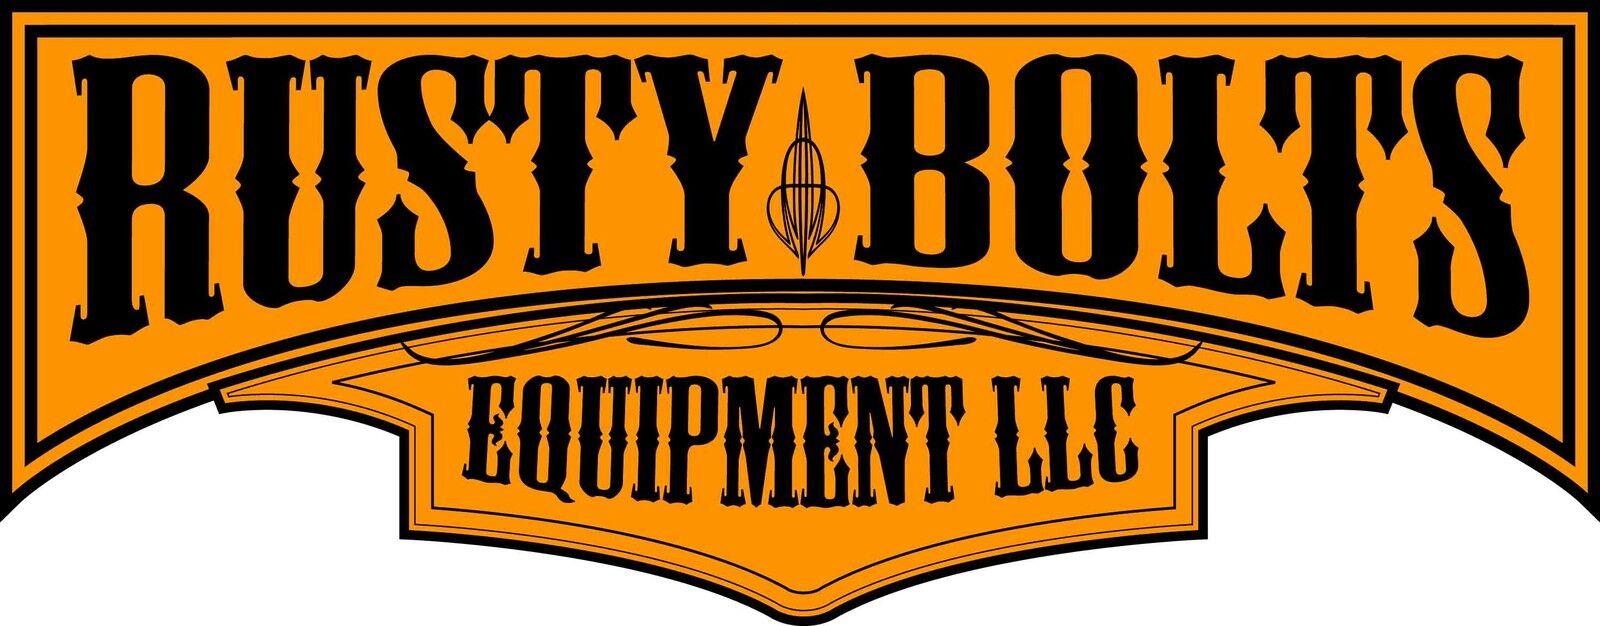 RUSTYBOLTS EQUIPMENT LLC